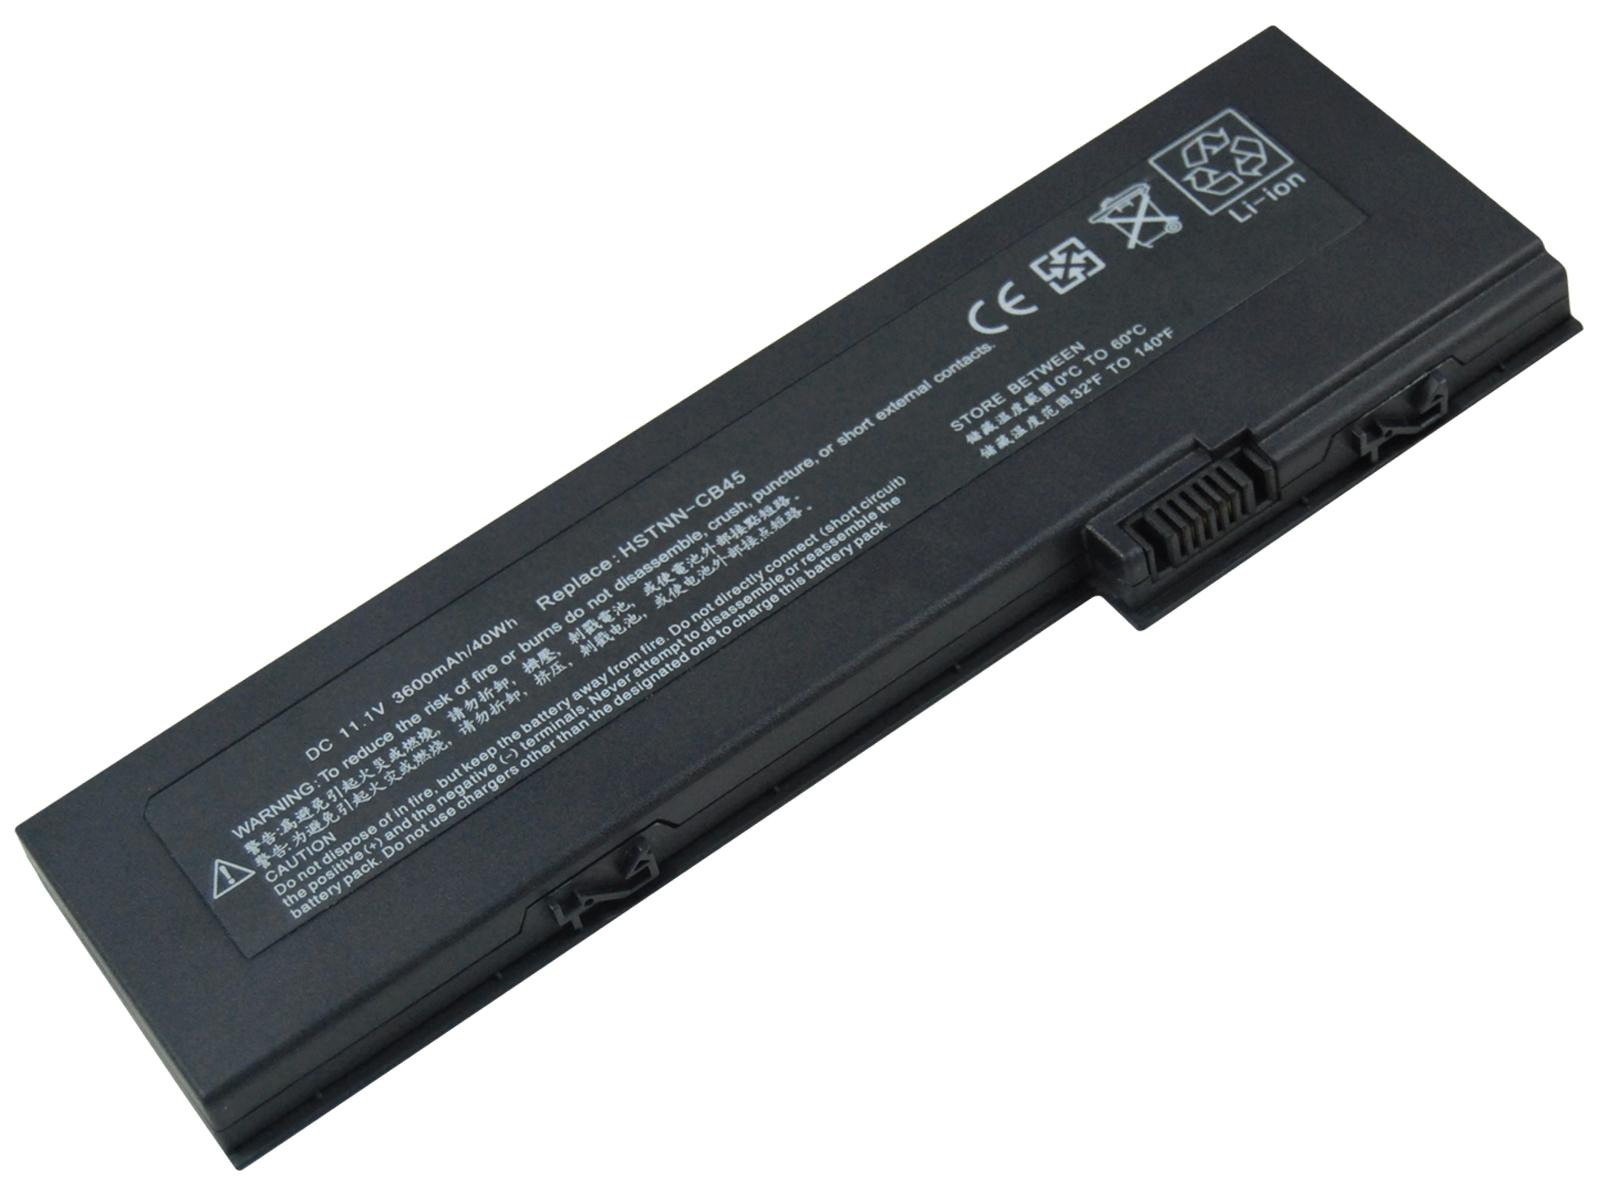 Аккумулятор для ноутбука HP 2710p, 2730p, 2740p